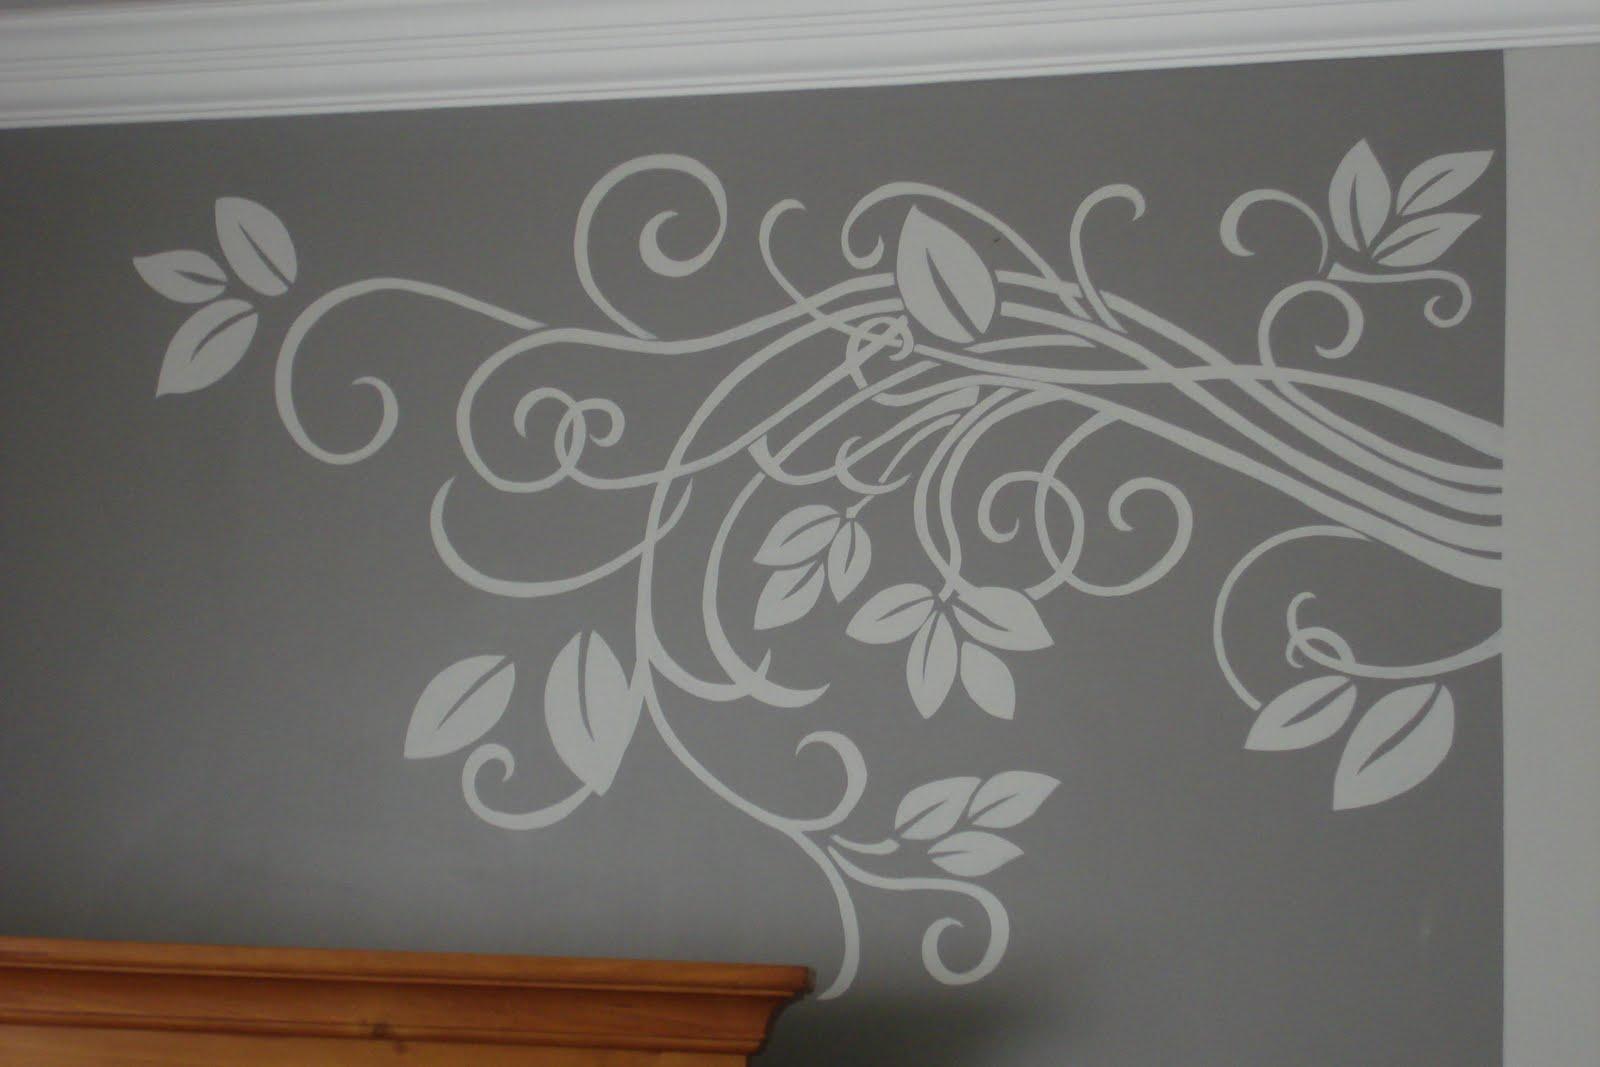 Pinturas decorativas em parede - Pinturas decorativas paredes ...